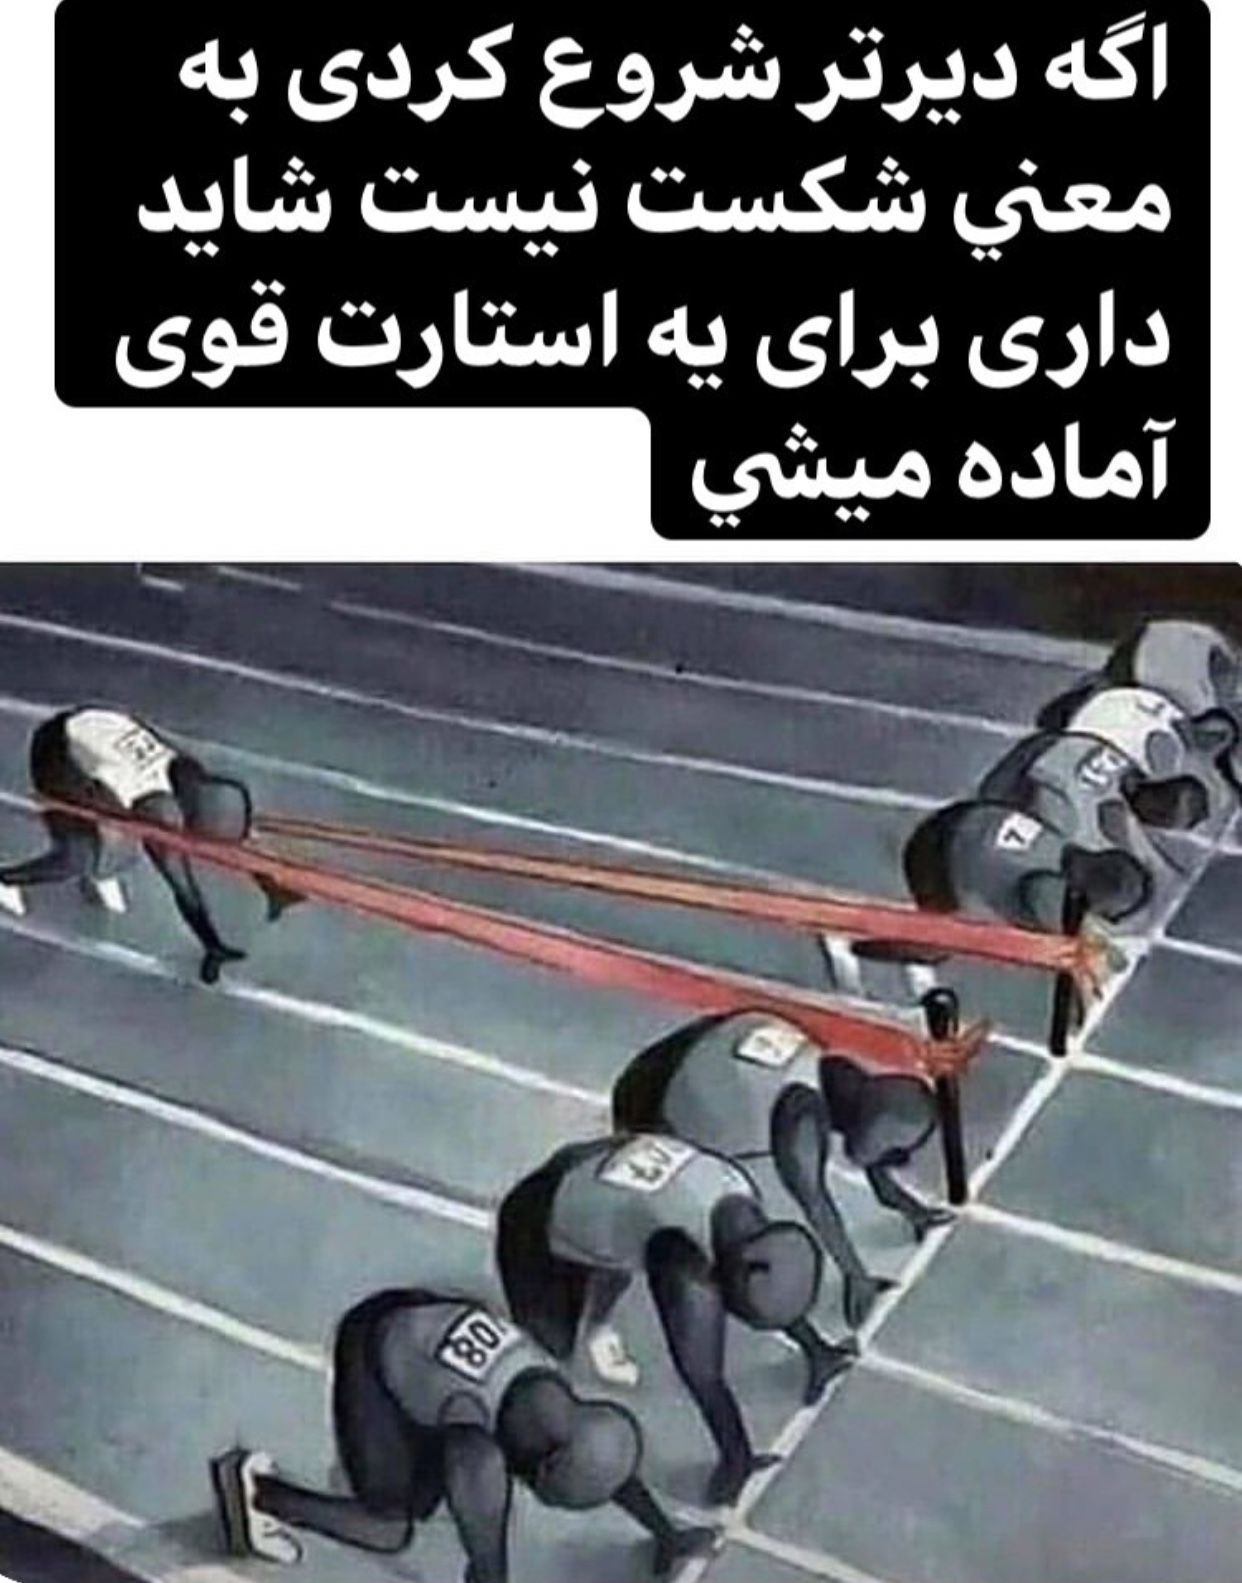 Pin By Shaboo On متن فارسی Matin Farsi Shoe Rack Lie